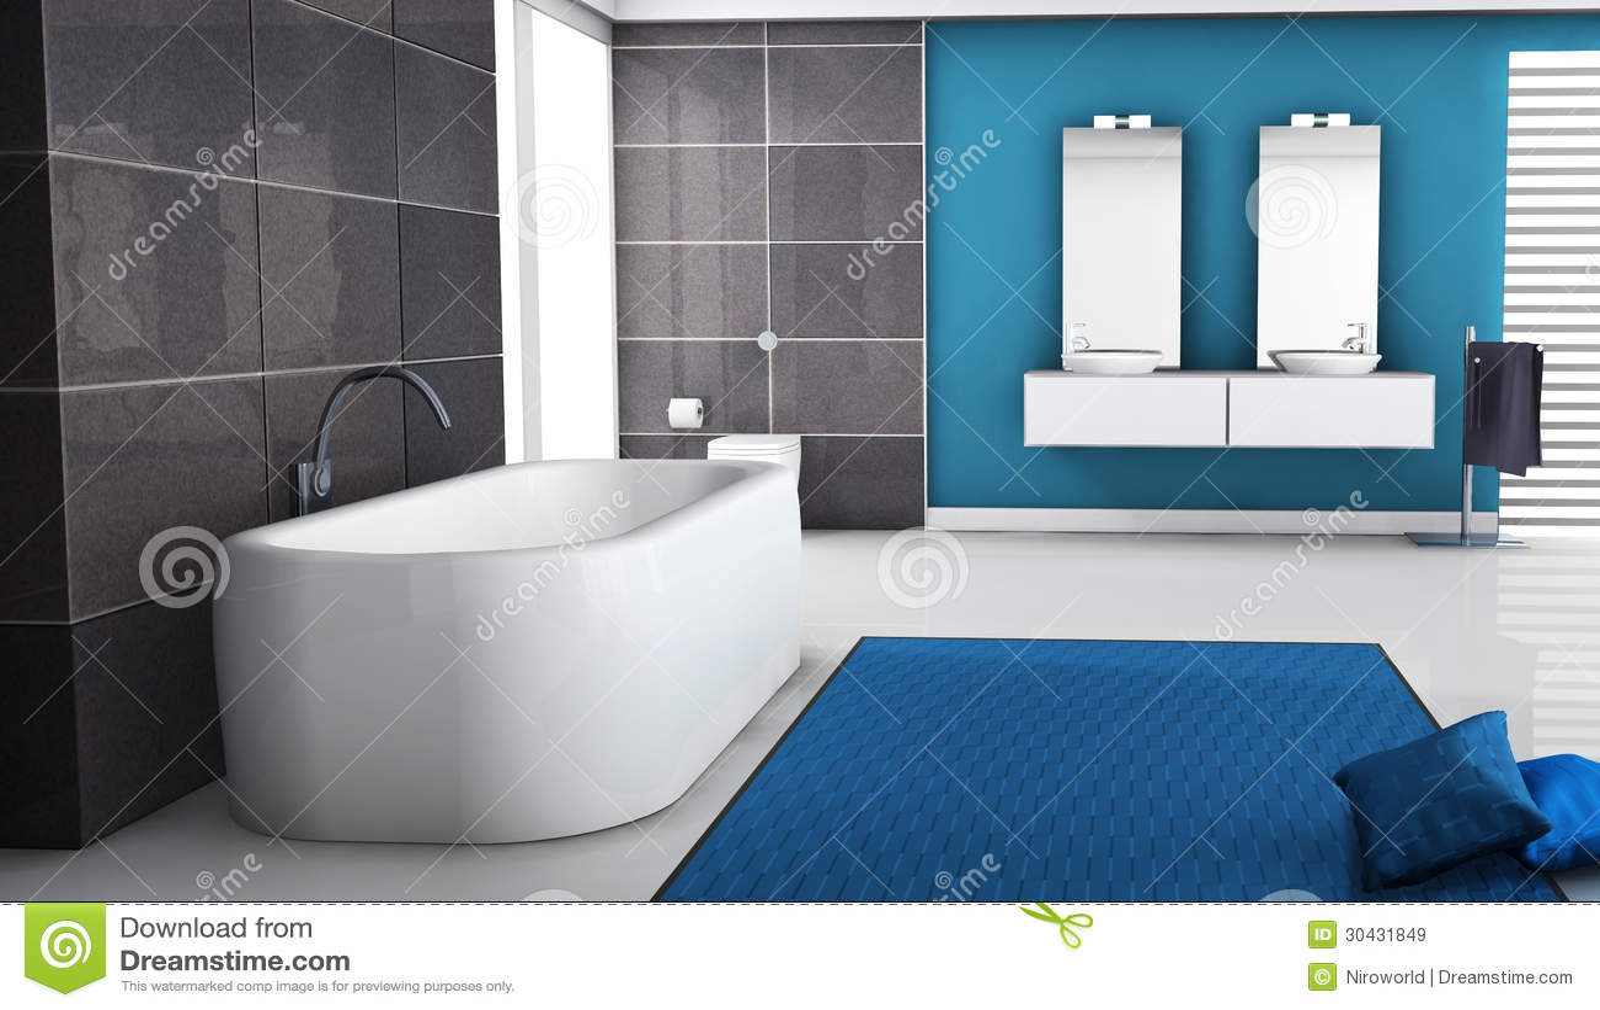 Bathroom Interior stock illustration. Illustration of blue - 30431849